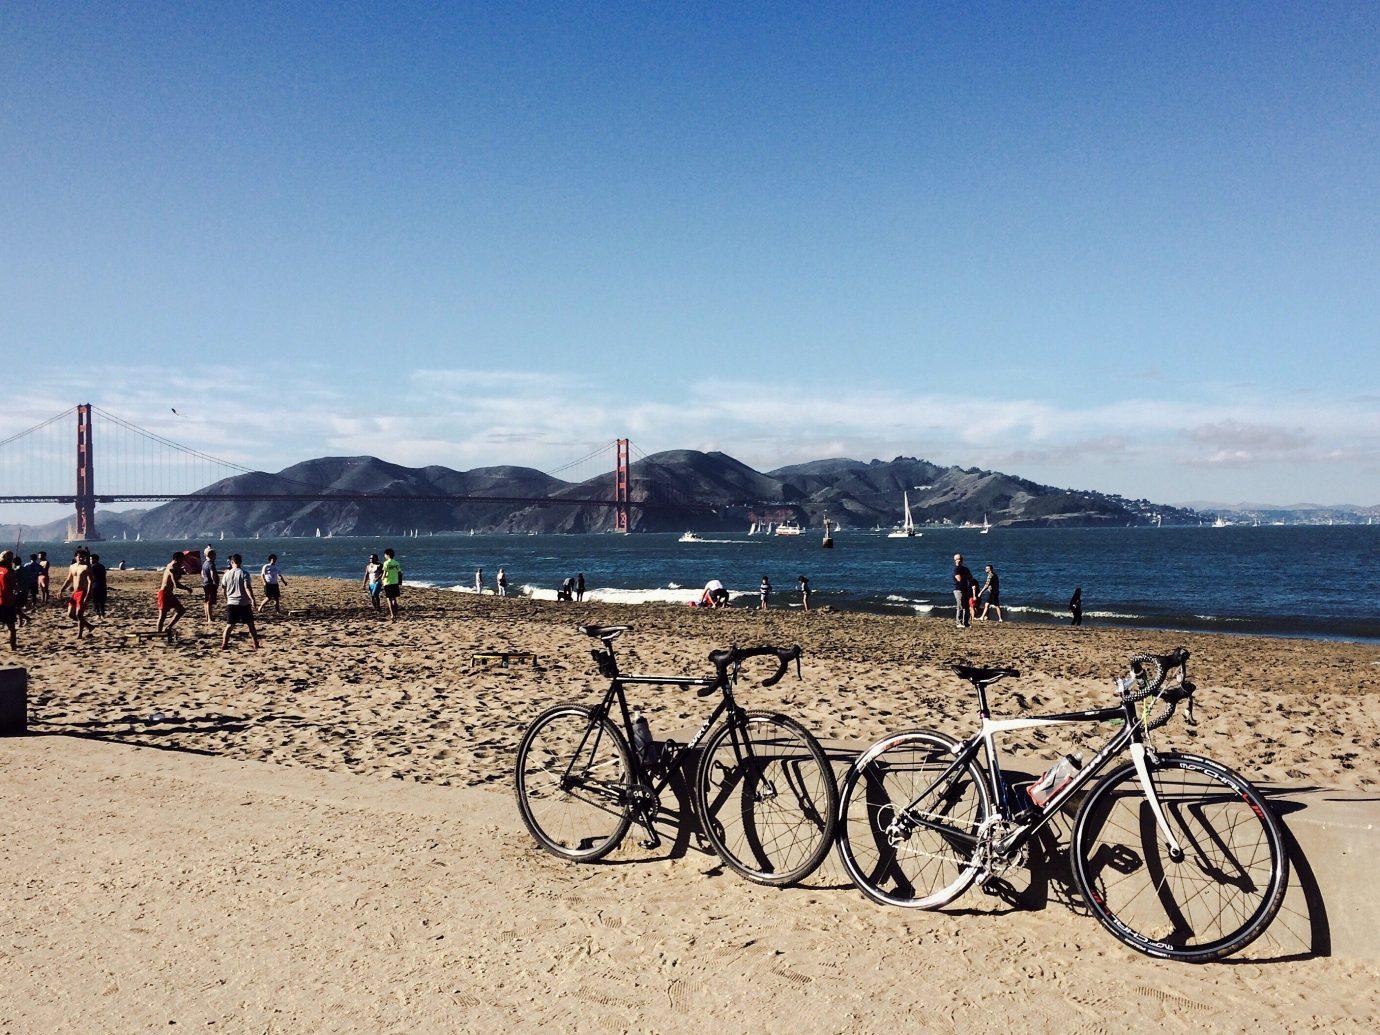 Trip Ideas sky outdoor ground Beach bicycle body of water Sea vehicle sand Coast shore landscape rack sandy soil